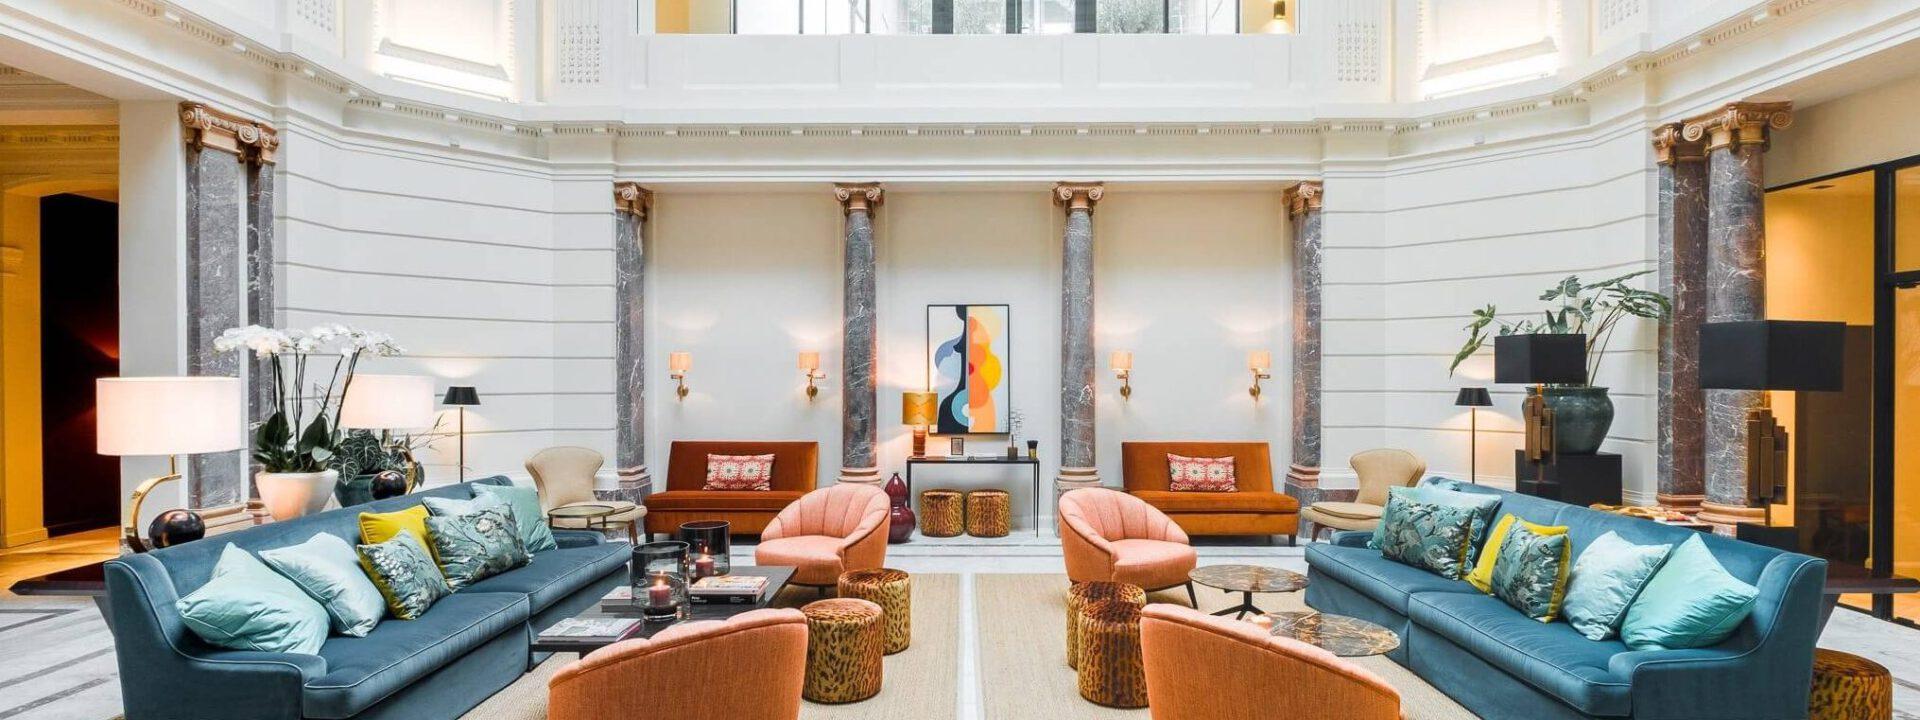 Hotel FRANQ en EW Facility Services laten oude tijden herleven